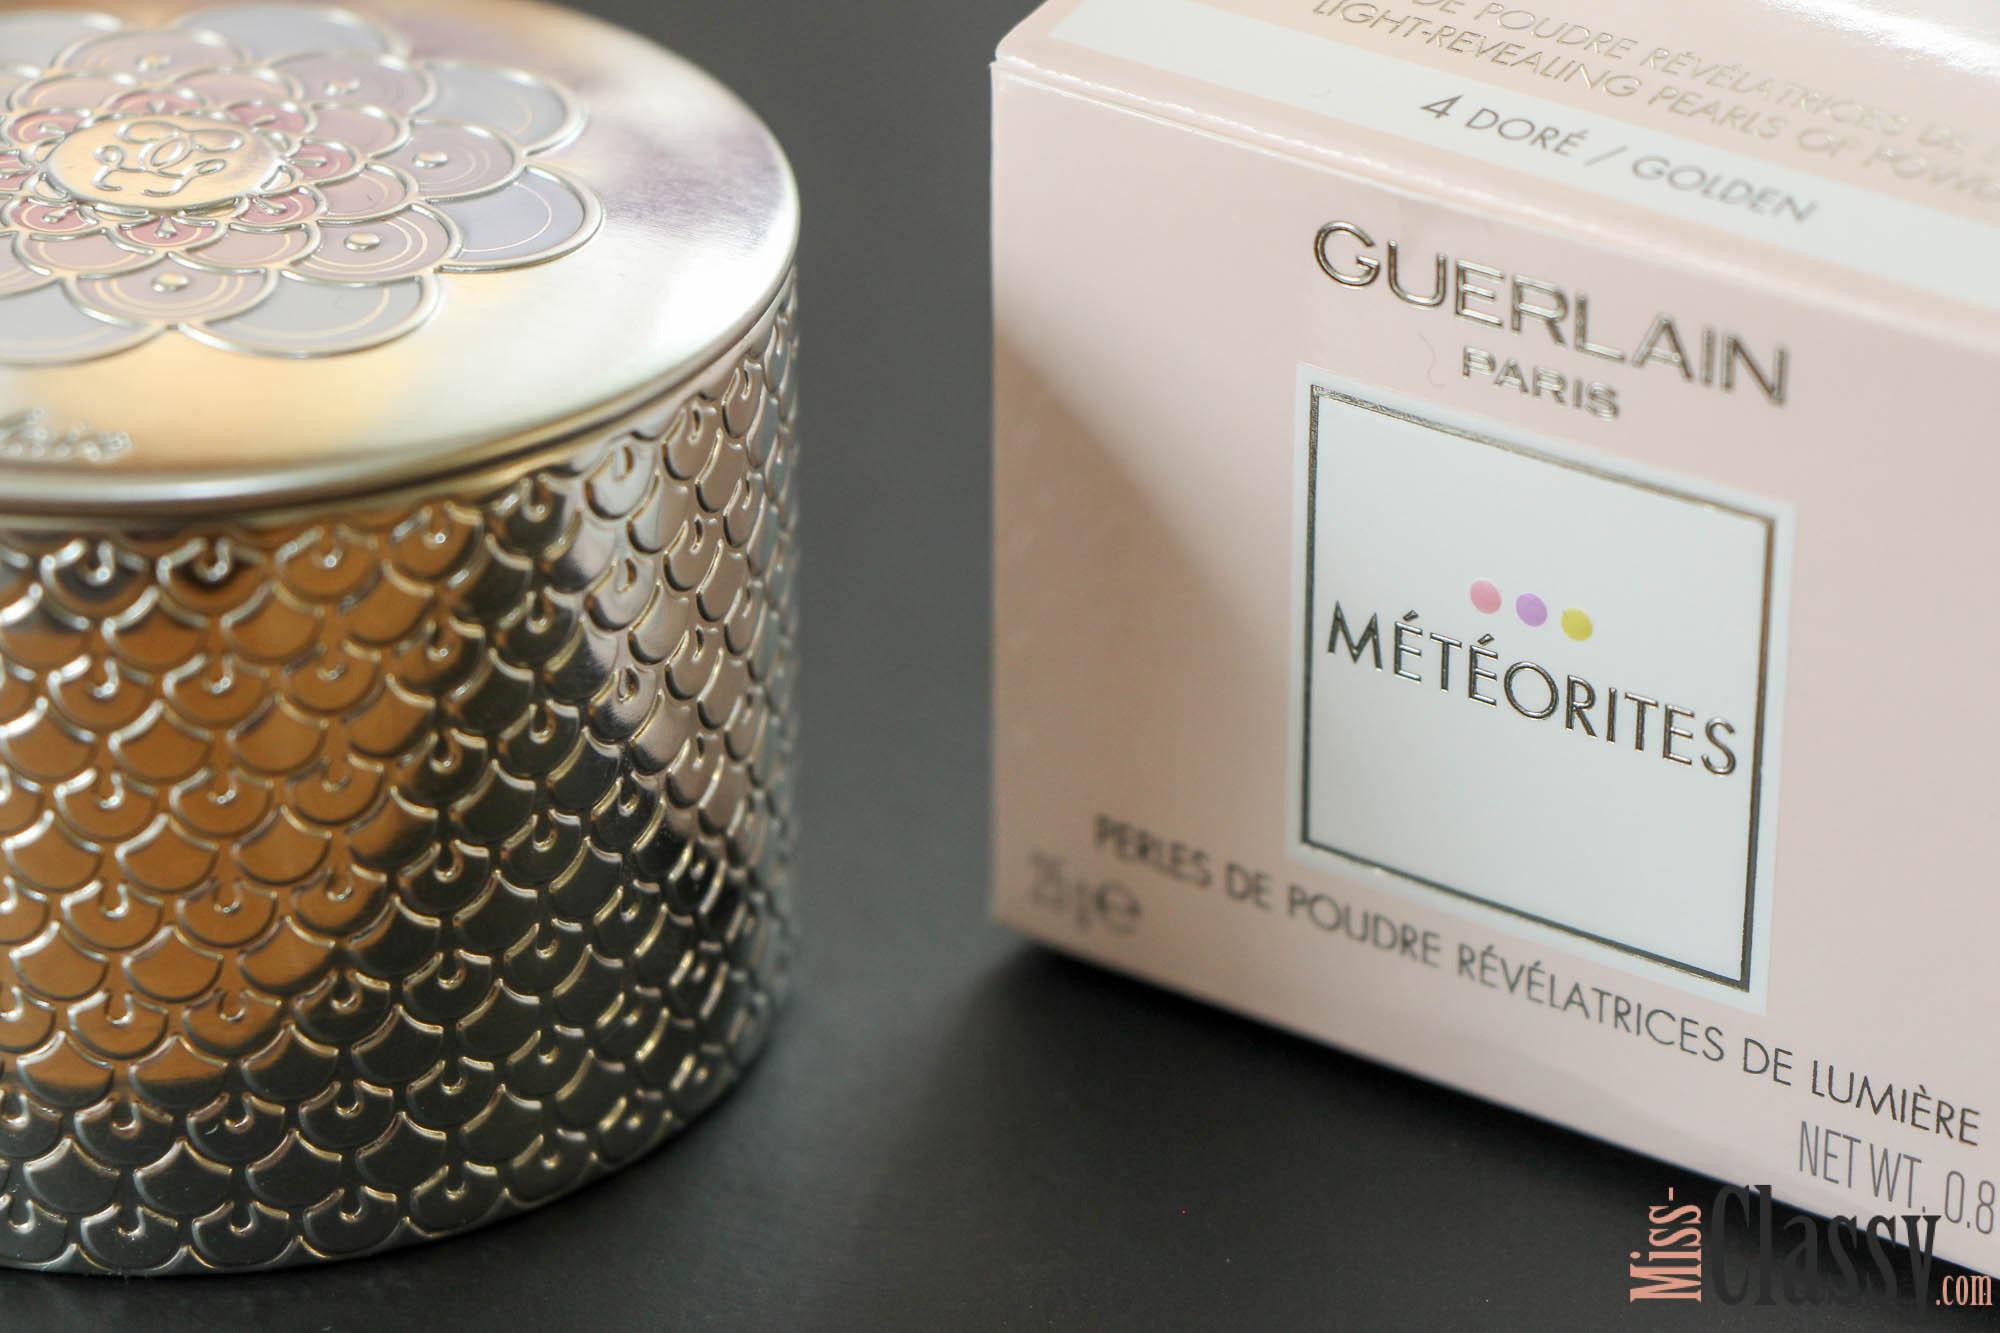 Guerlain Les Meteorites_02